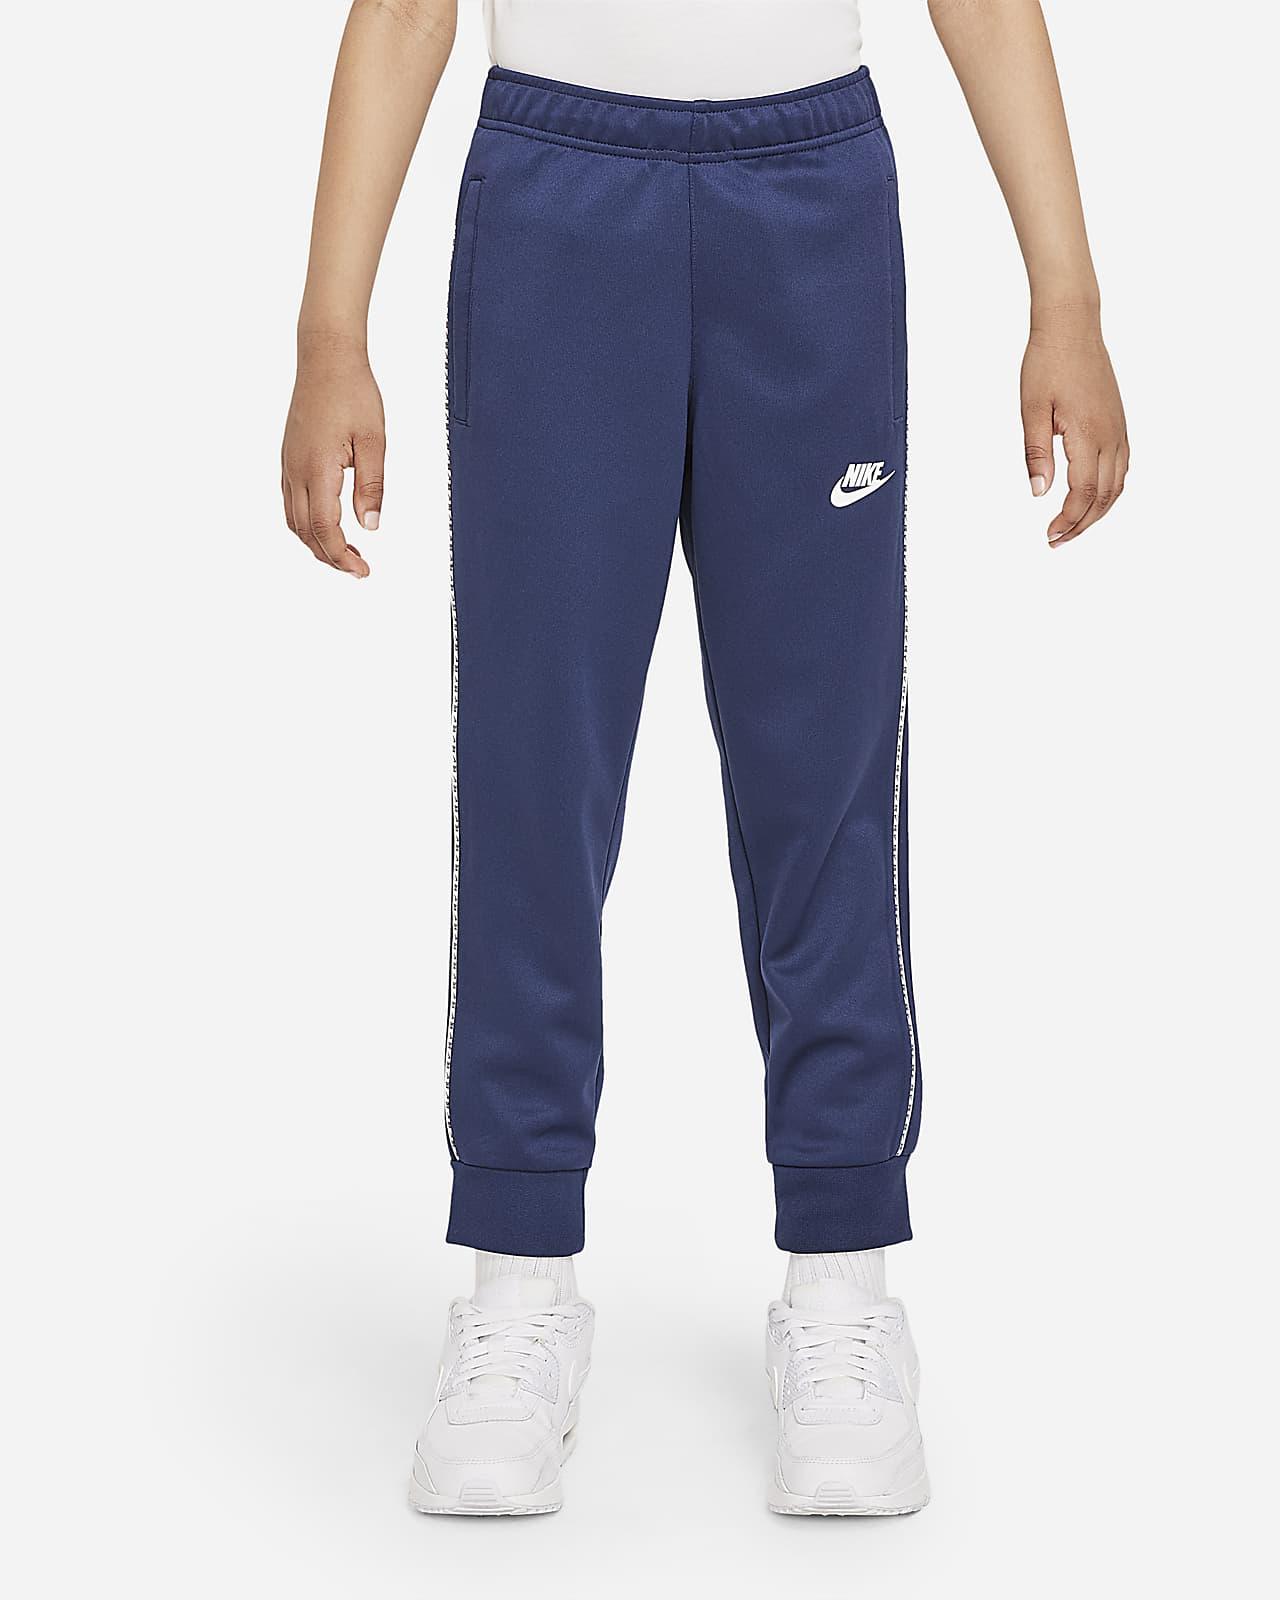 Nike Sportswear-joggers til store børn (drenge)